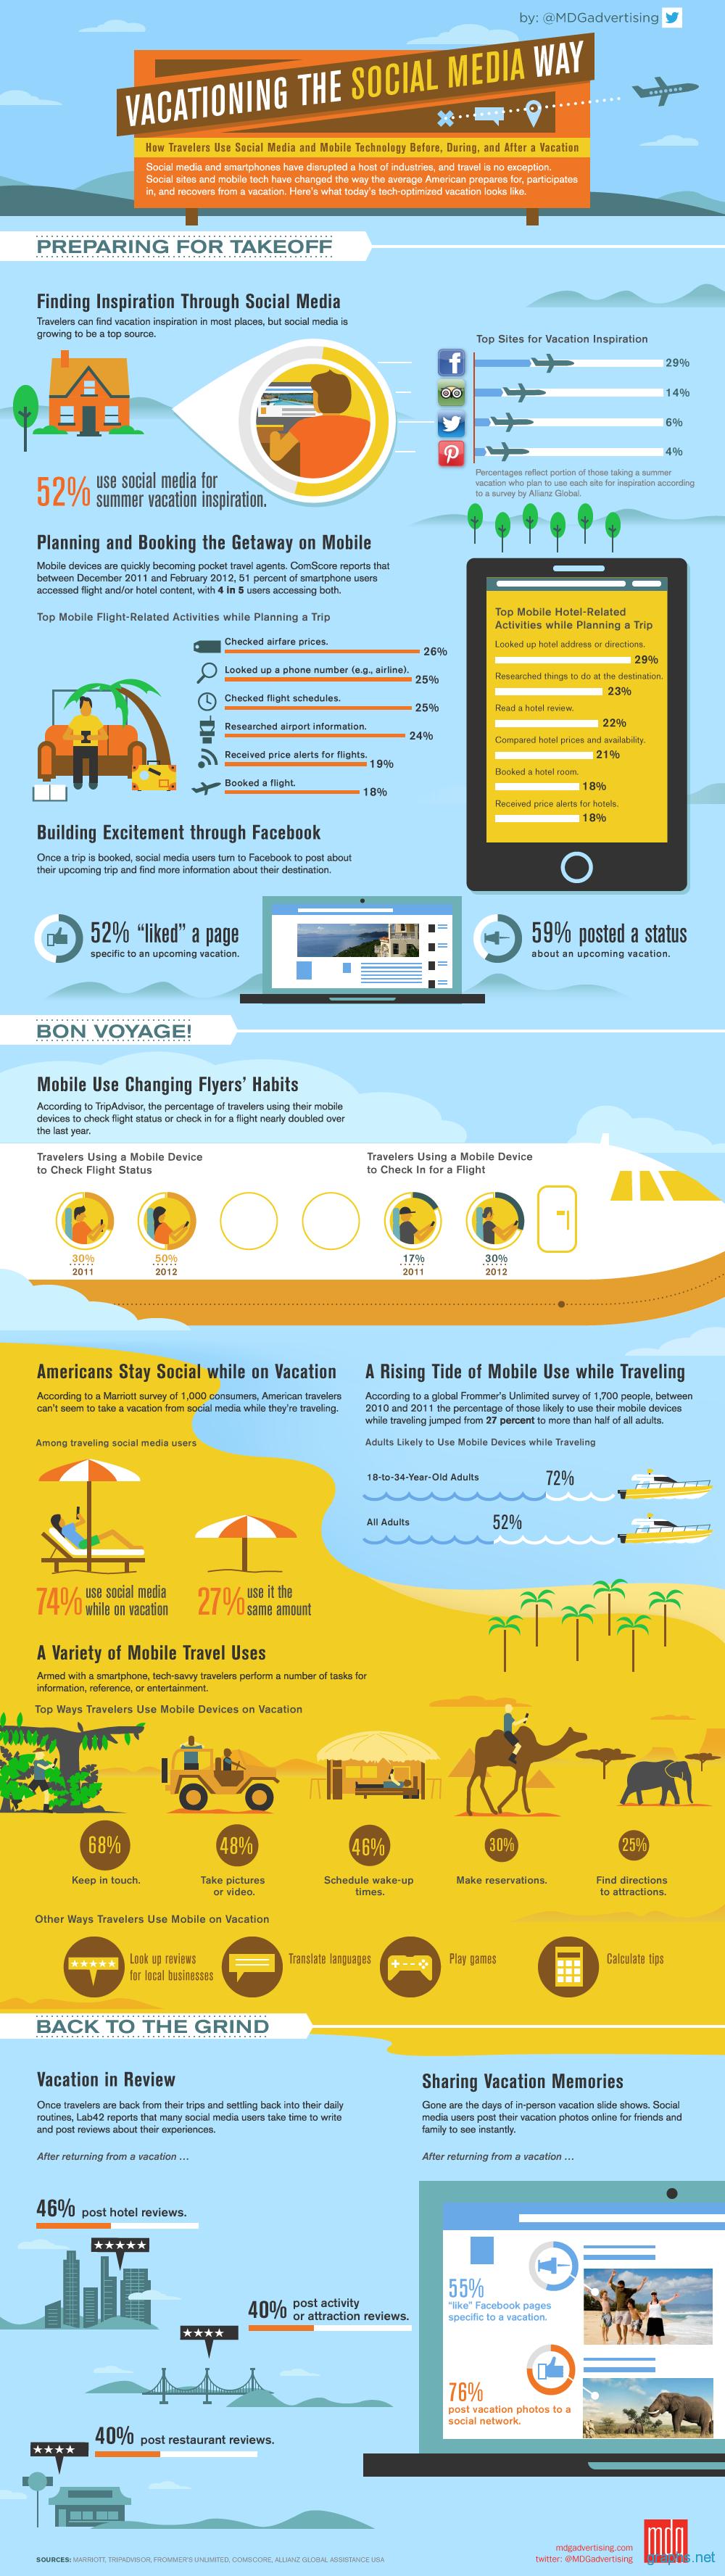 Social Media Usage During Vacation